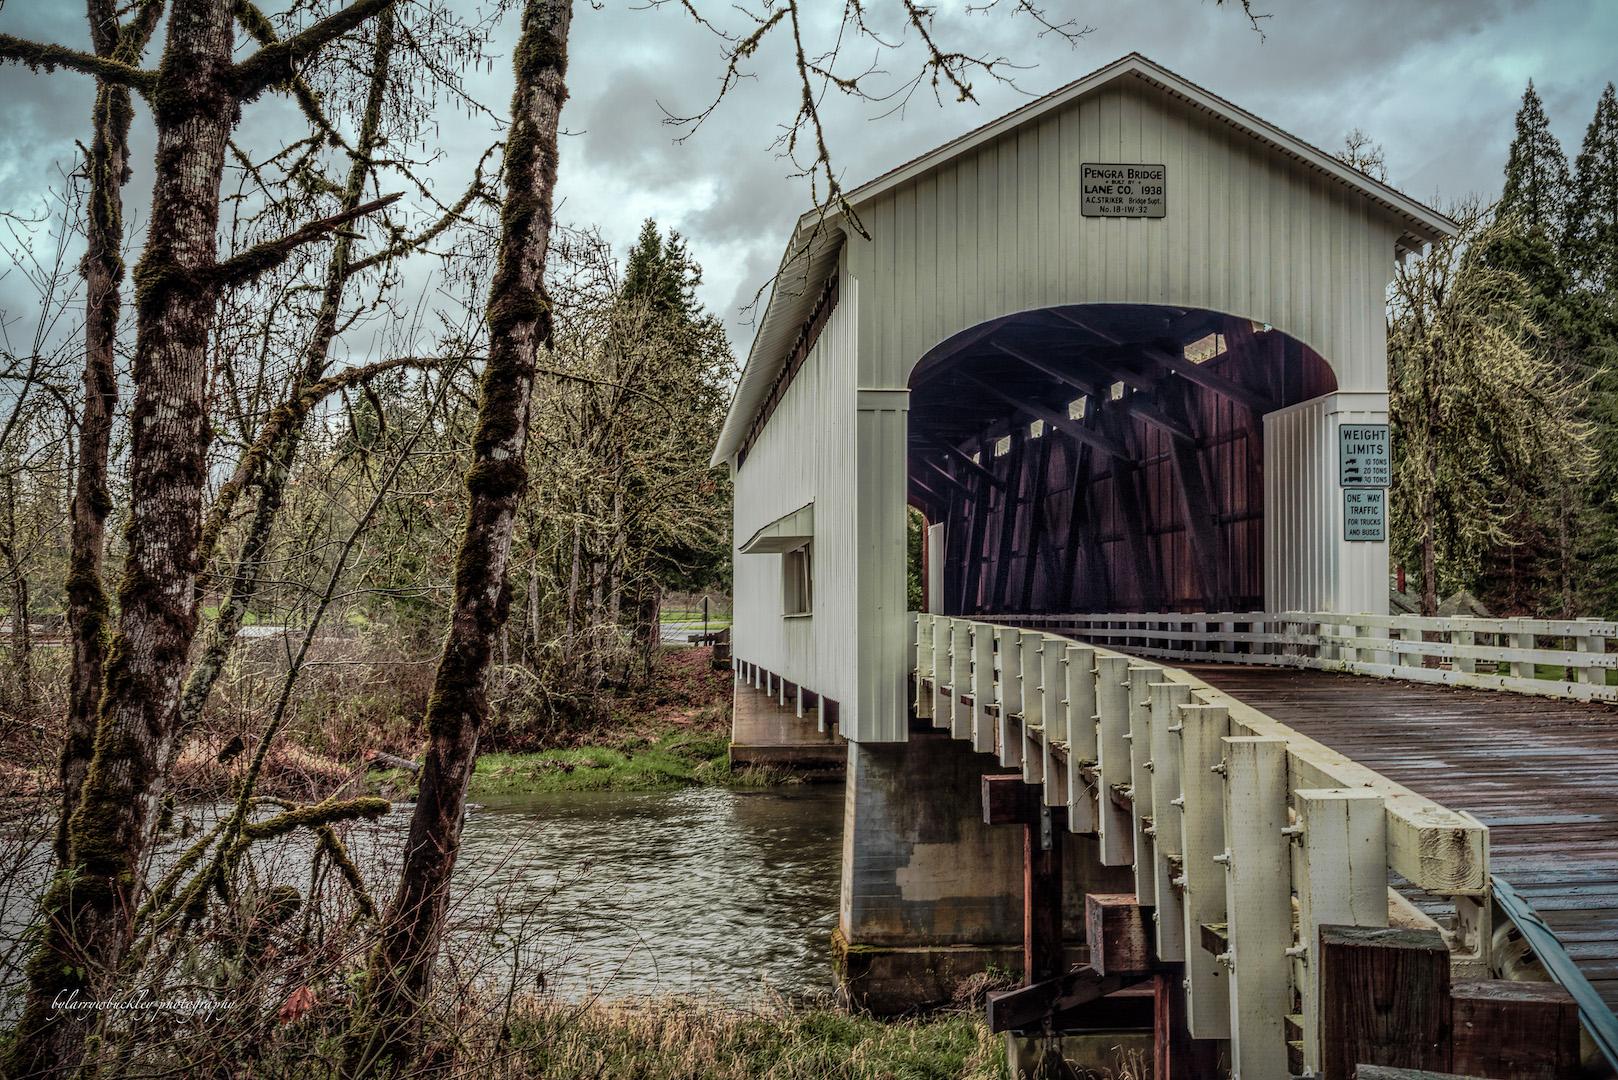 Pengra Bridge